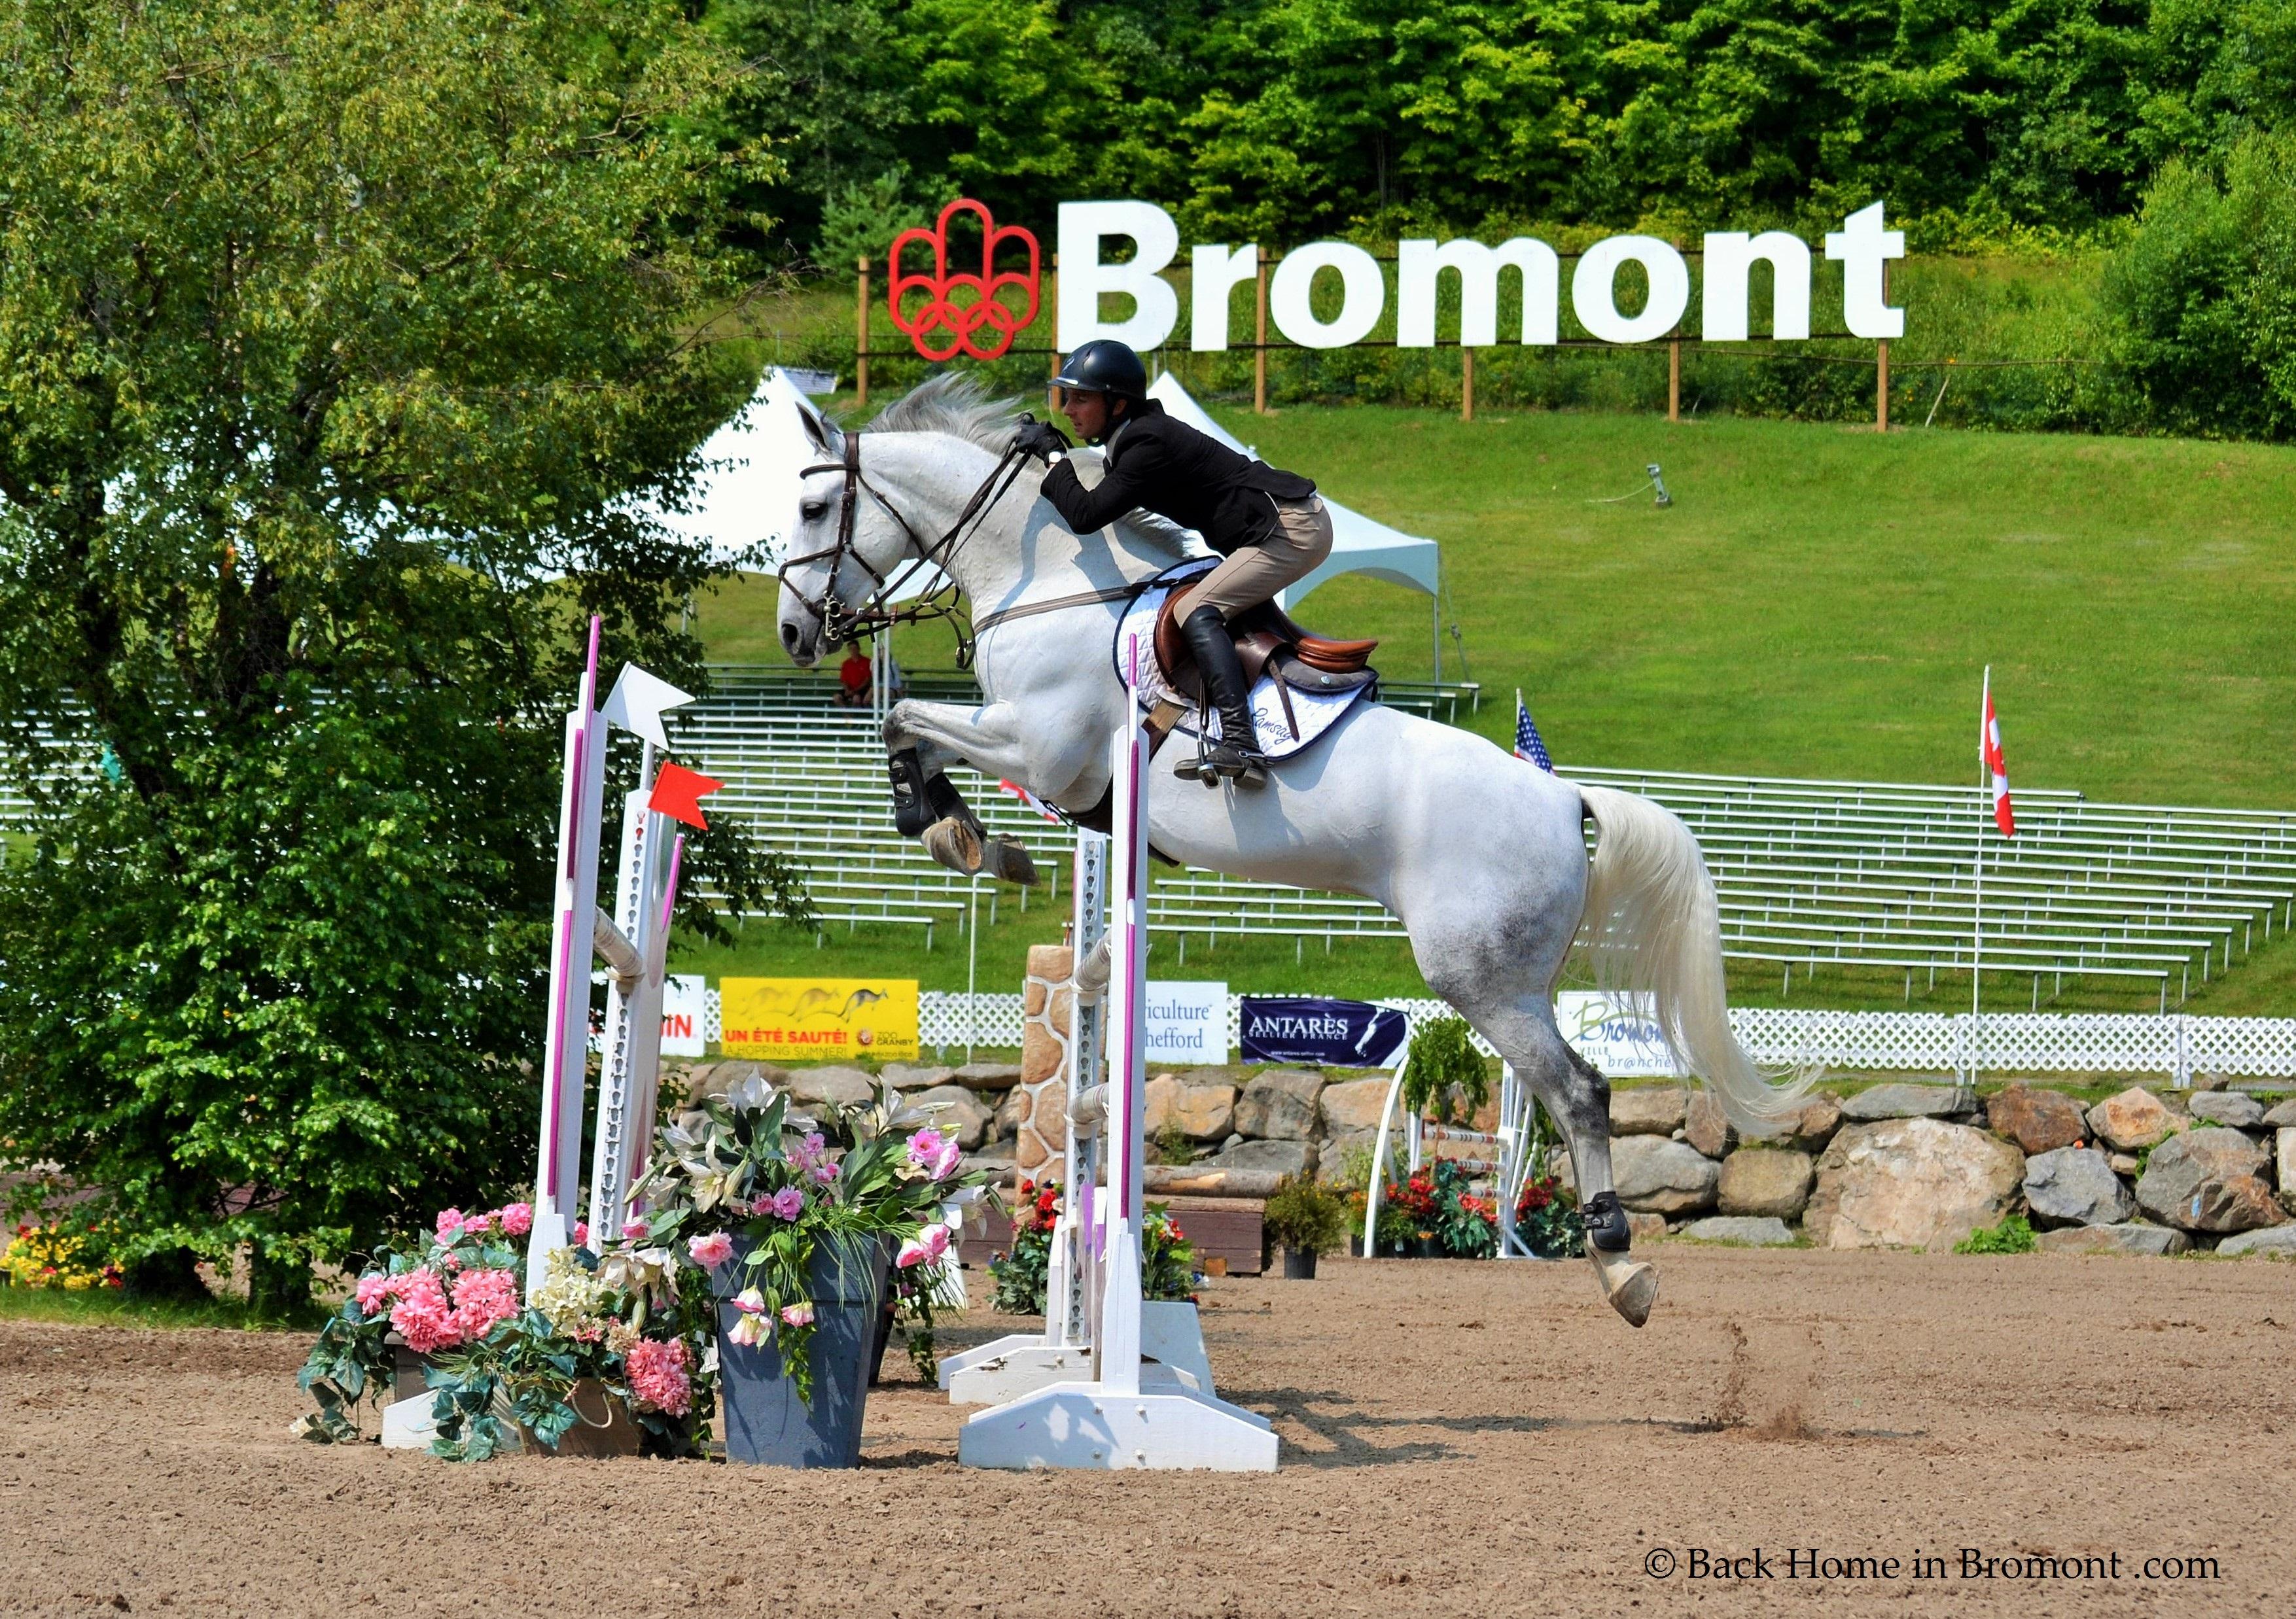 2017 Schedule For Bromont Olympic Equestrian Park EN